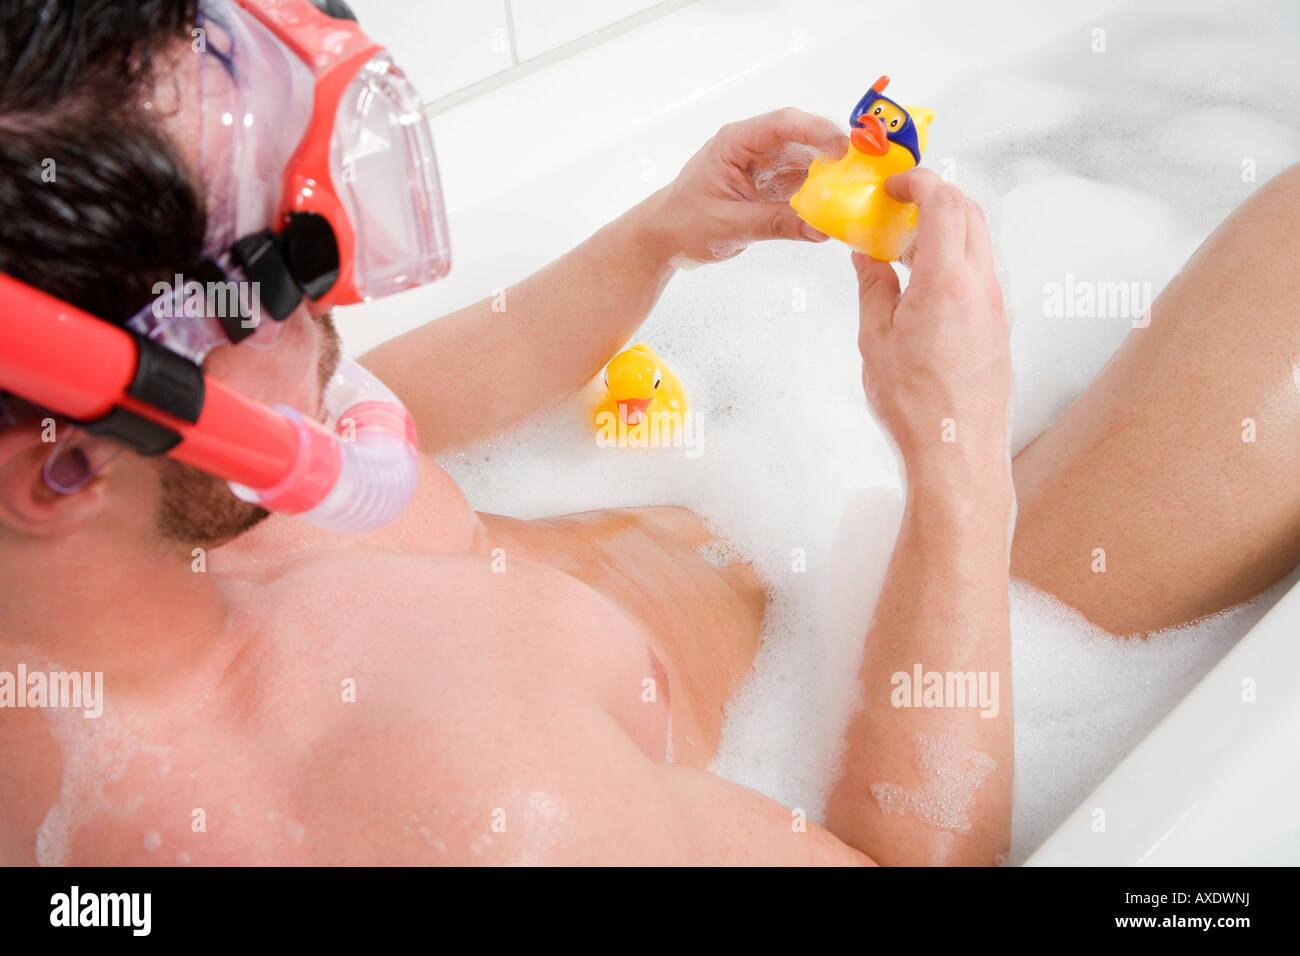 Man in bathtub with rubber duck, portrait Stock Photo: 16814477 - Alamy